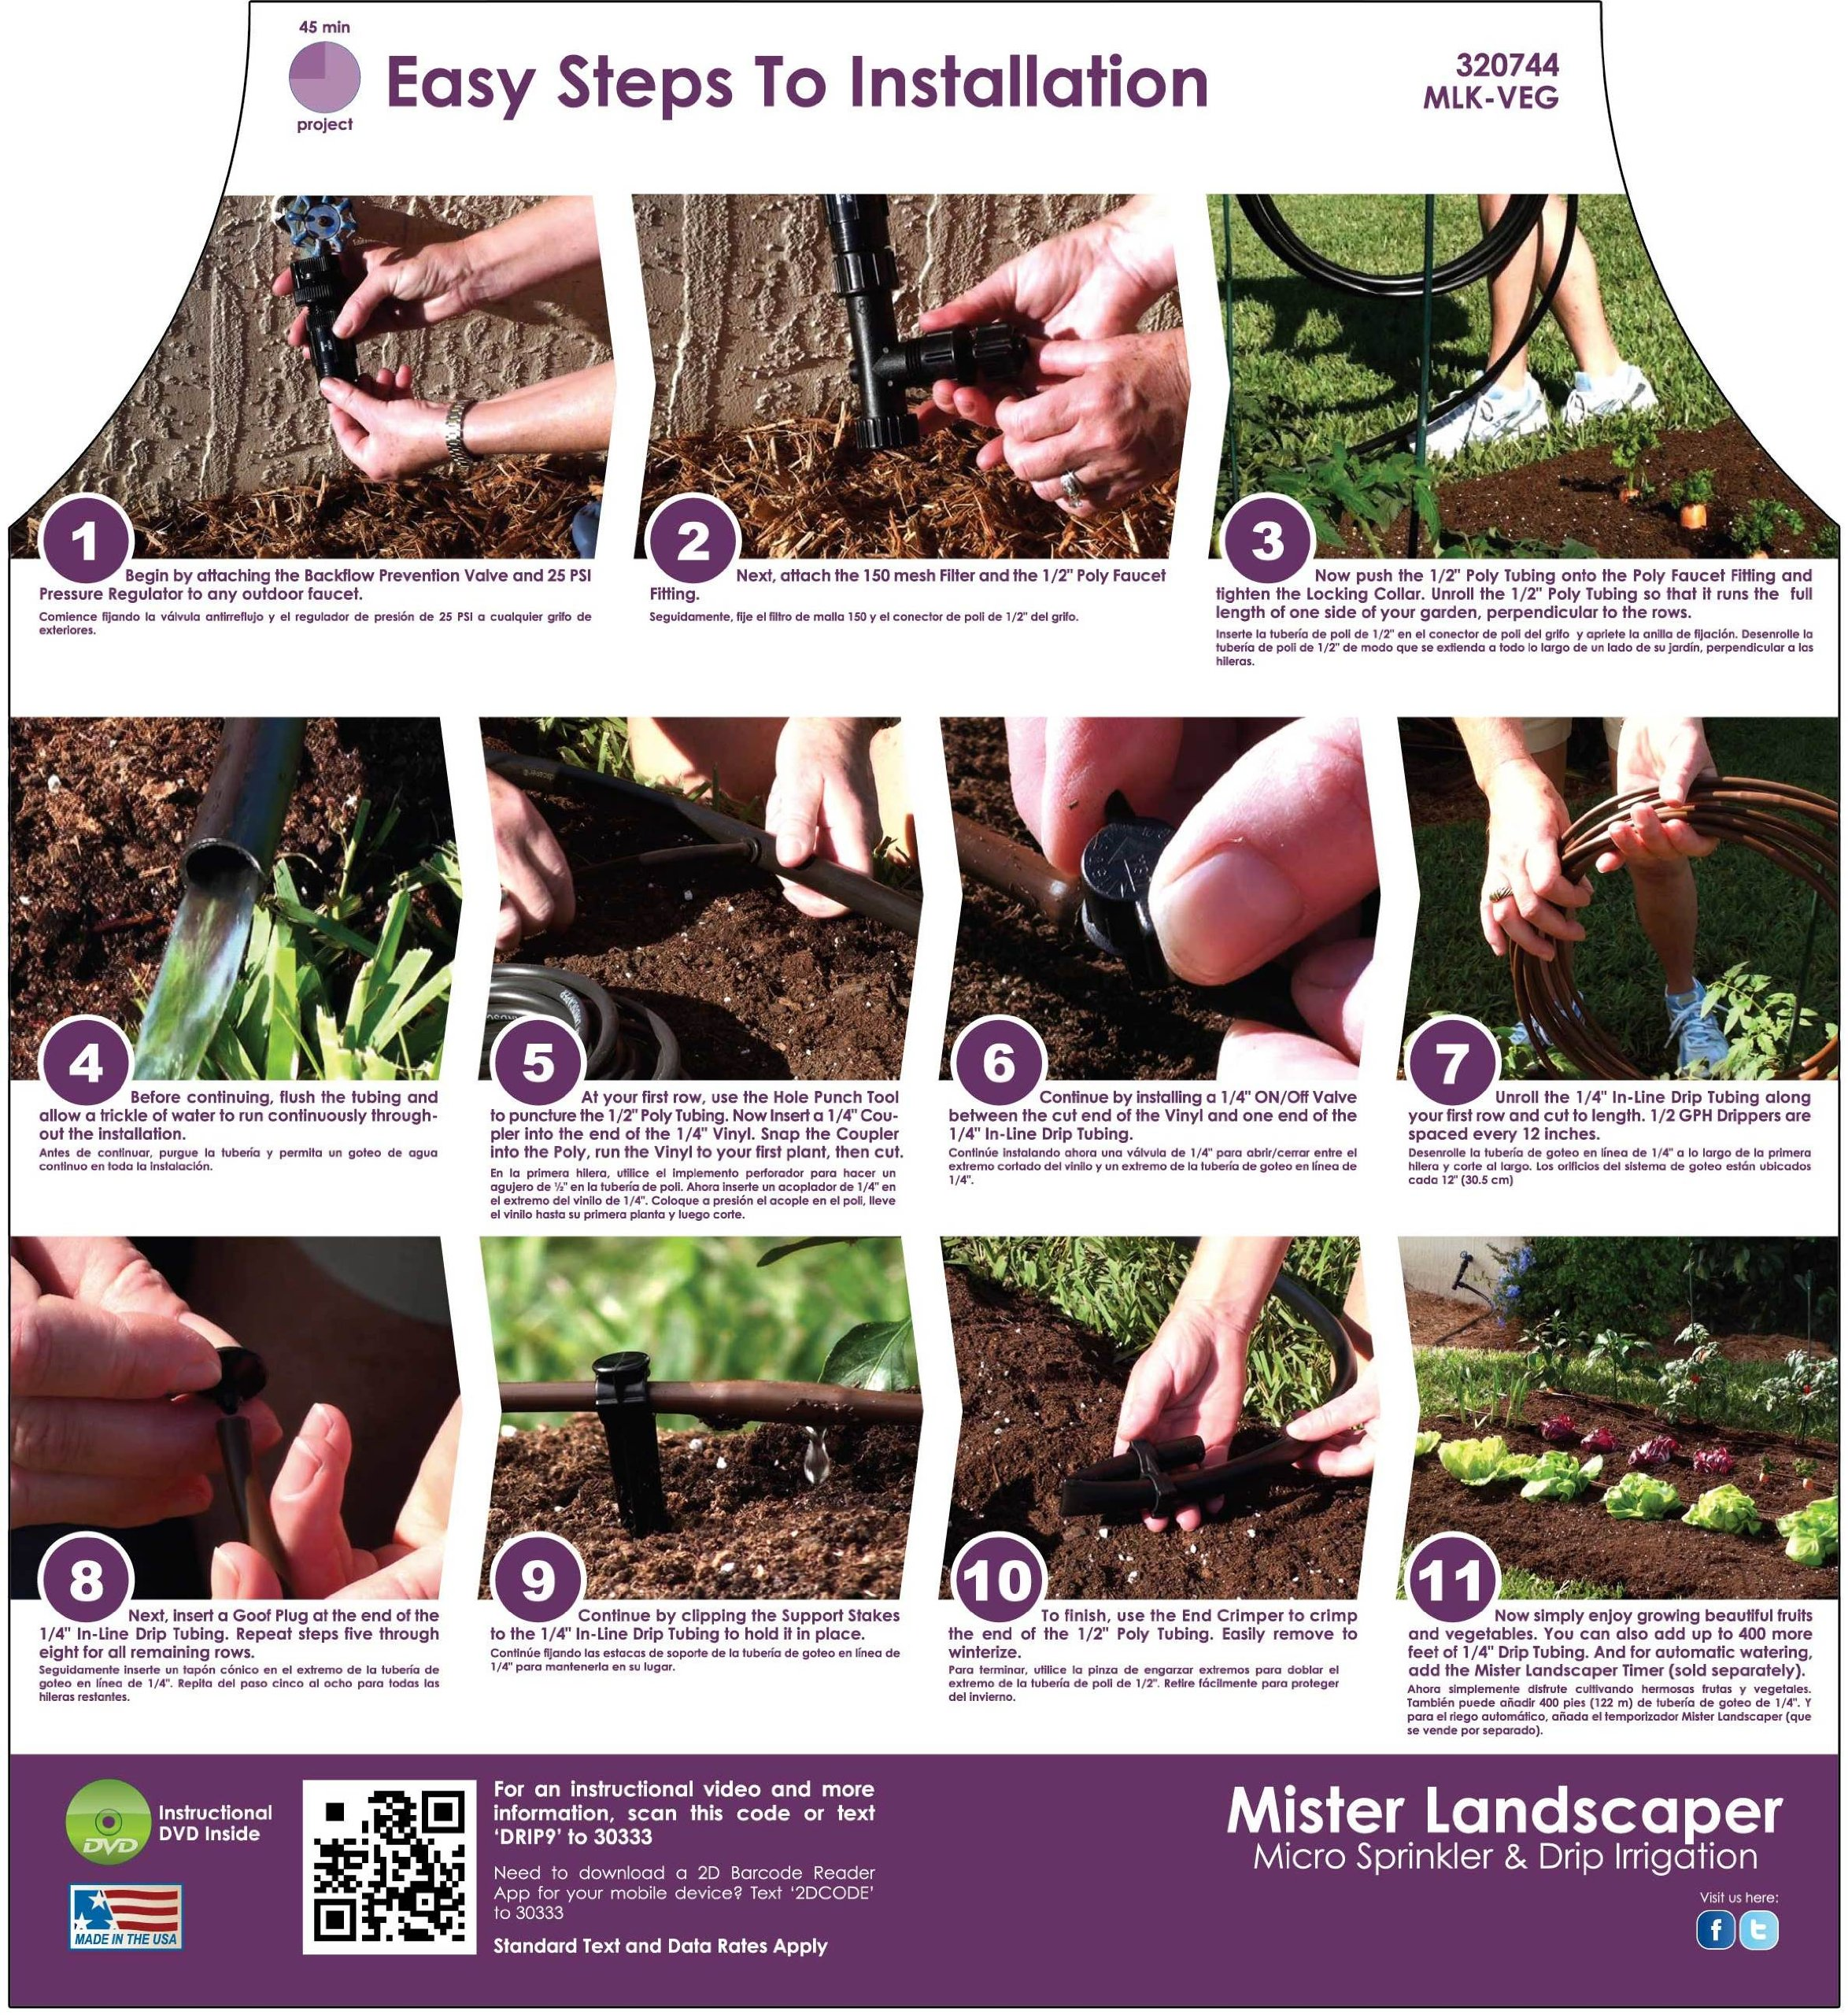 Mister Landscaper MLK-Veg Vegetable Garden Drip Irrigation Kit by Mister Landscaper